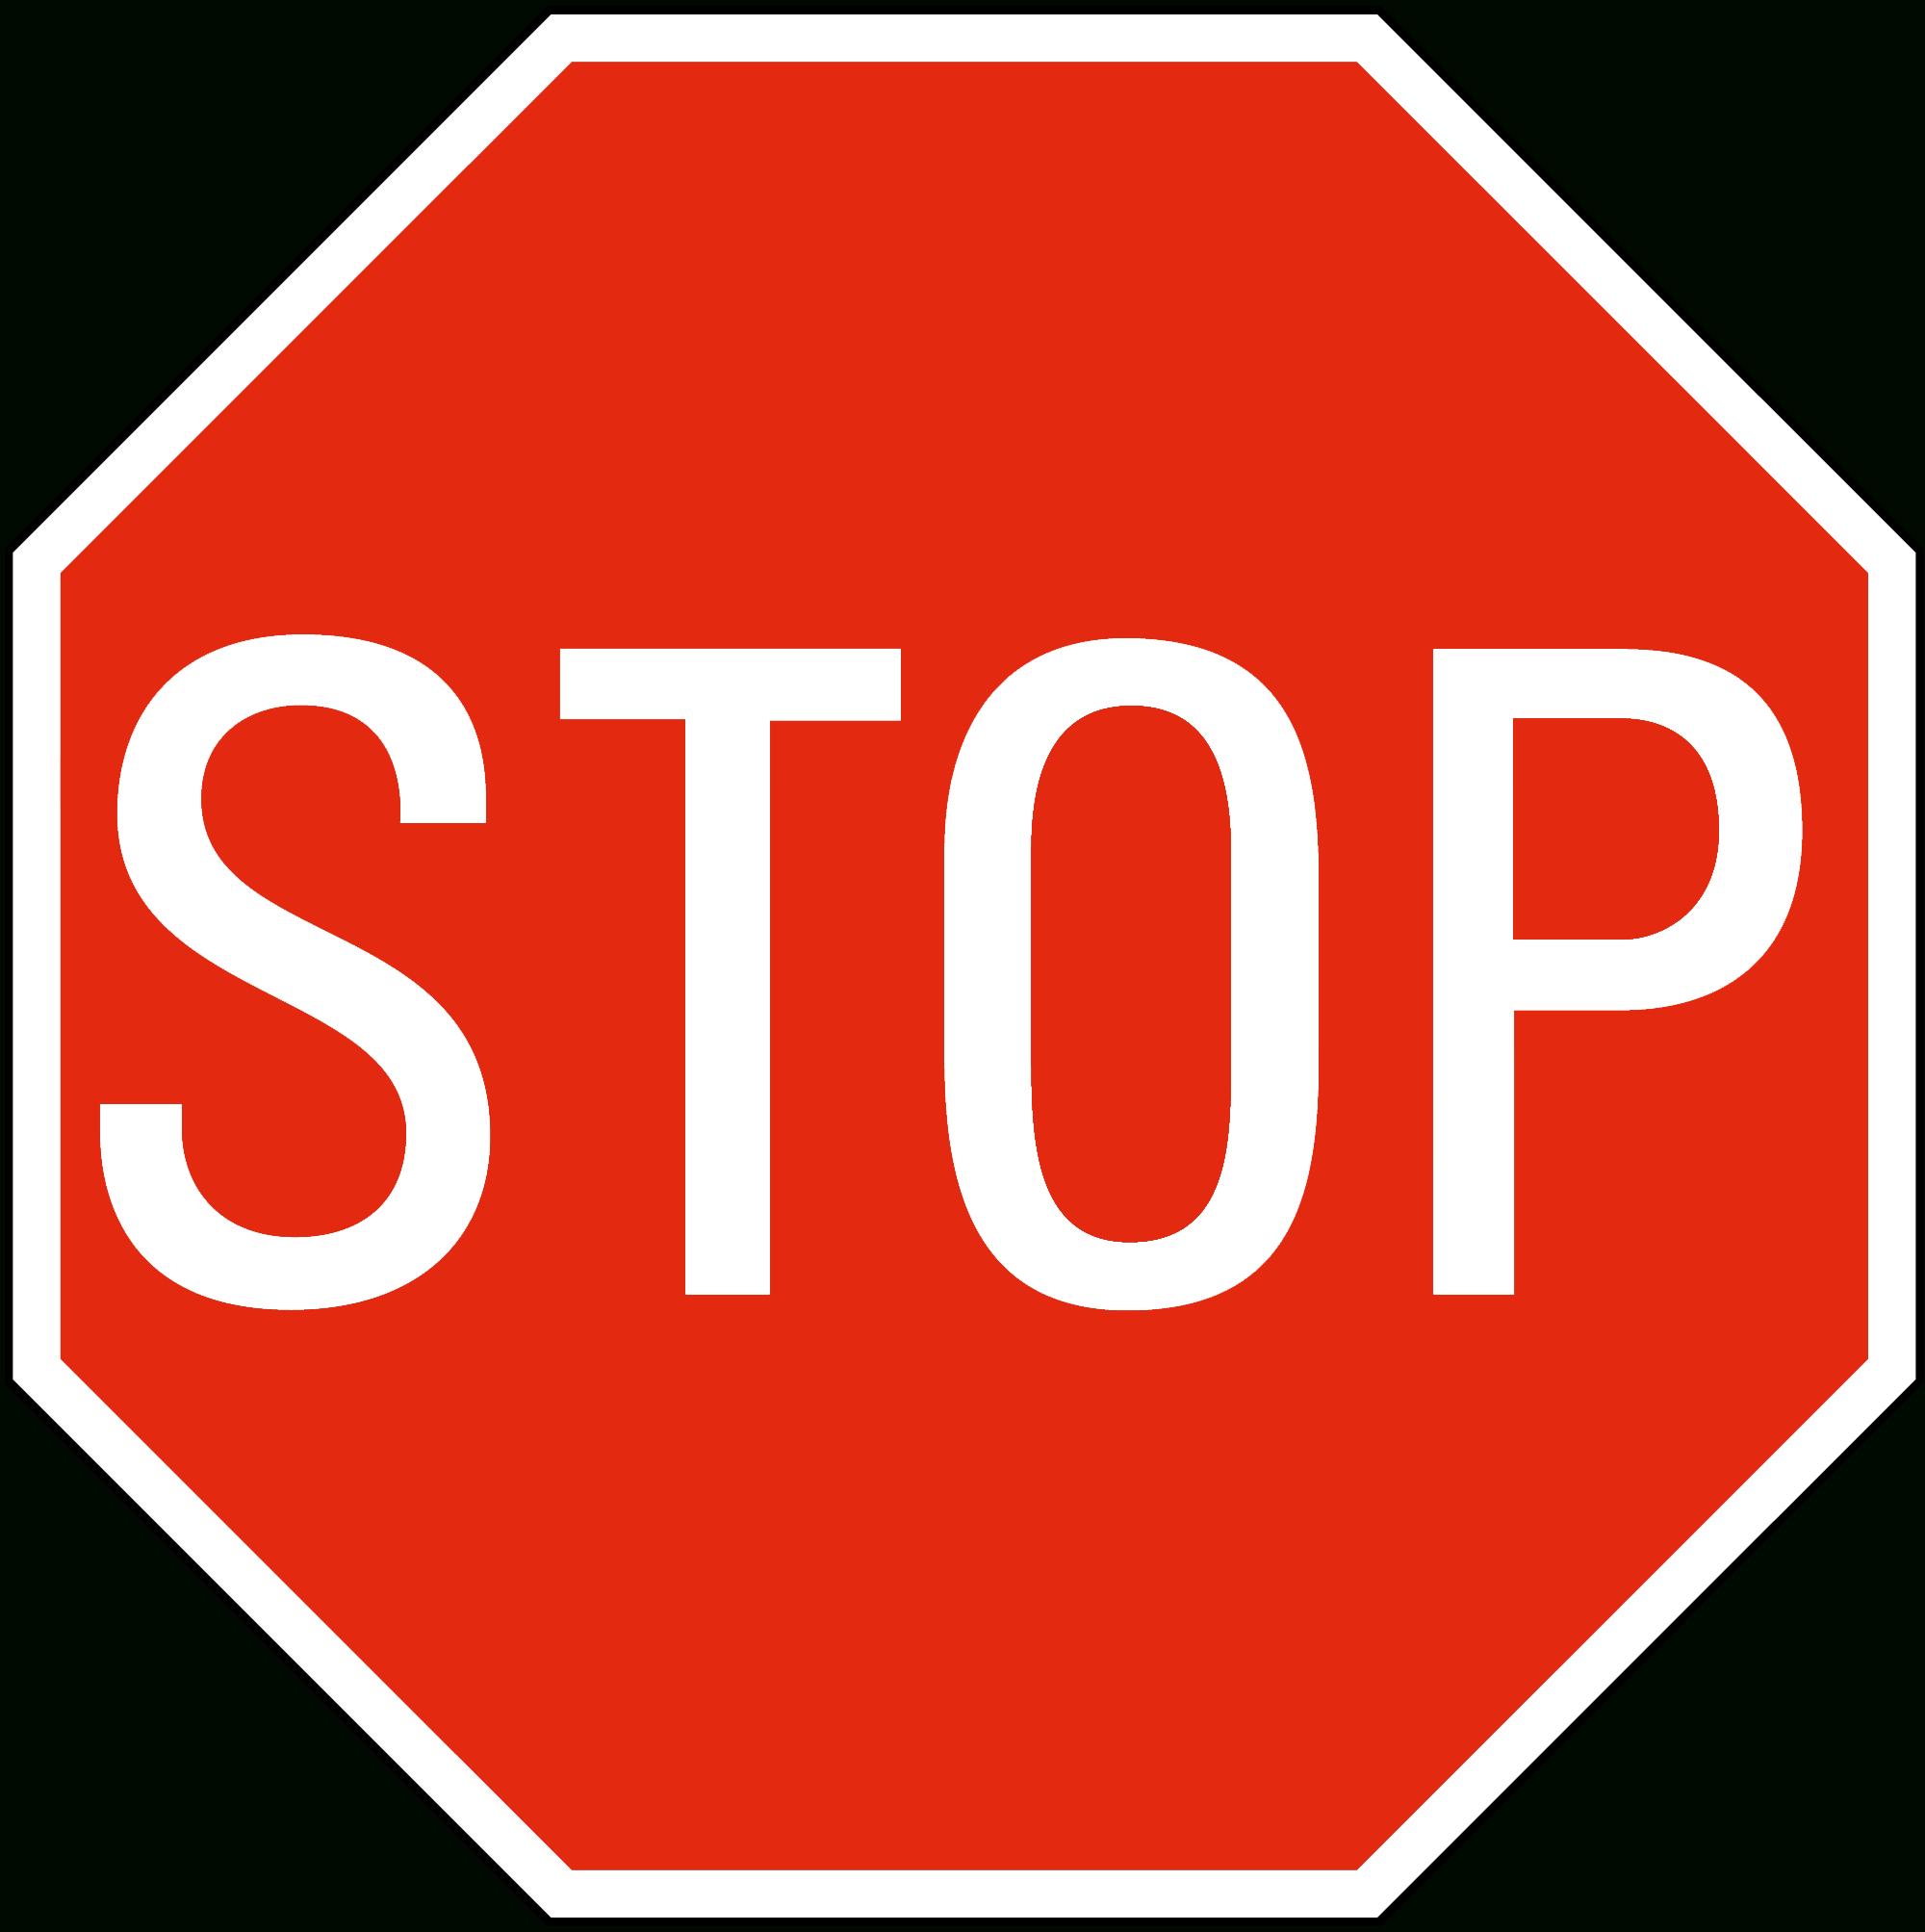 Free Free Printable Stop Sign, Download Free Clip Art, Free Clip Art - Free Printable Stop Sign To Color